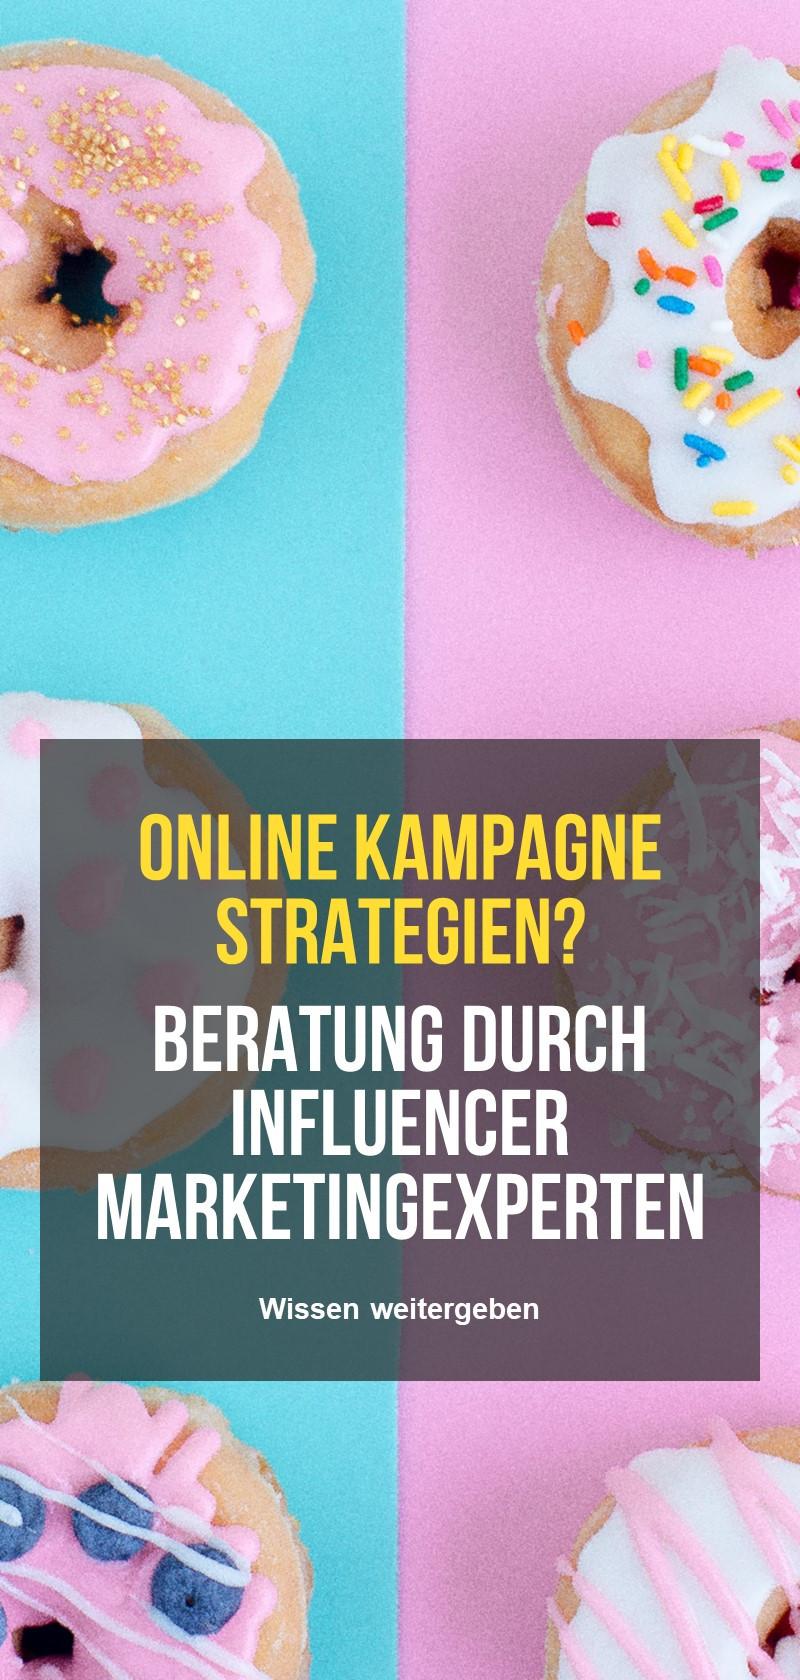 Influencer-Marketing-Experten